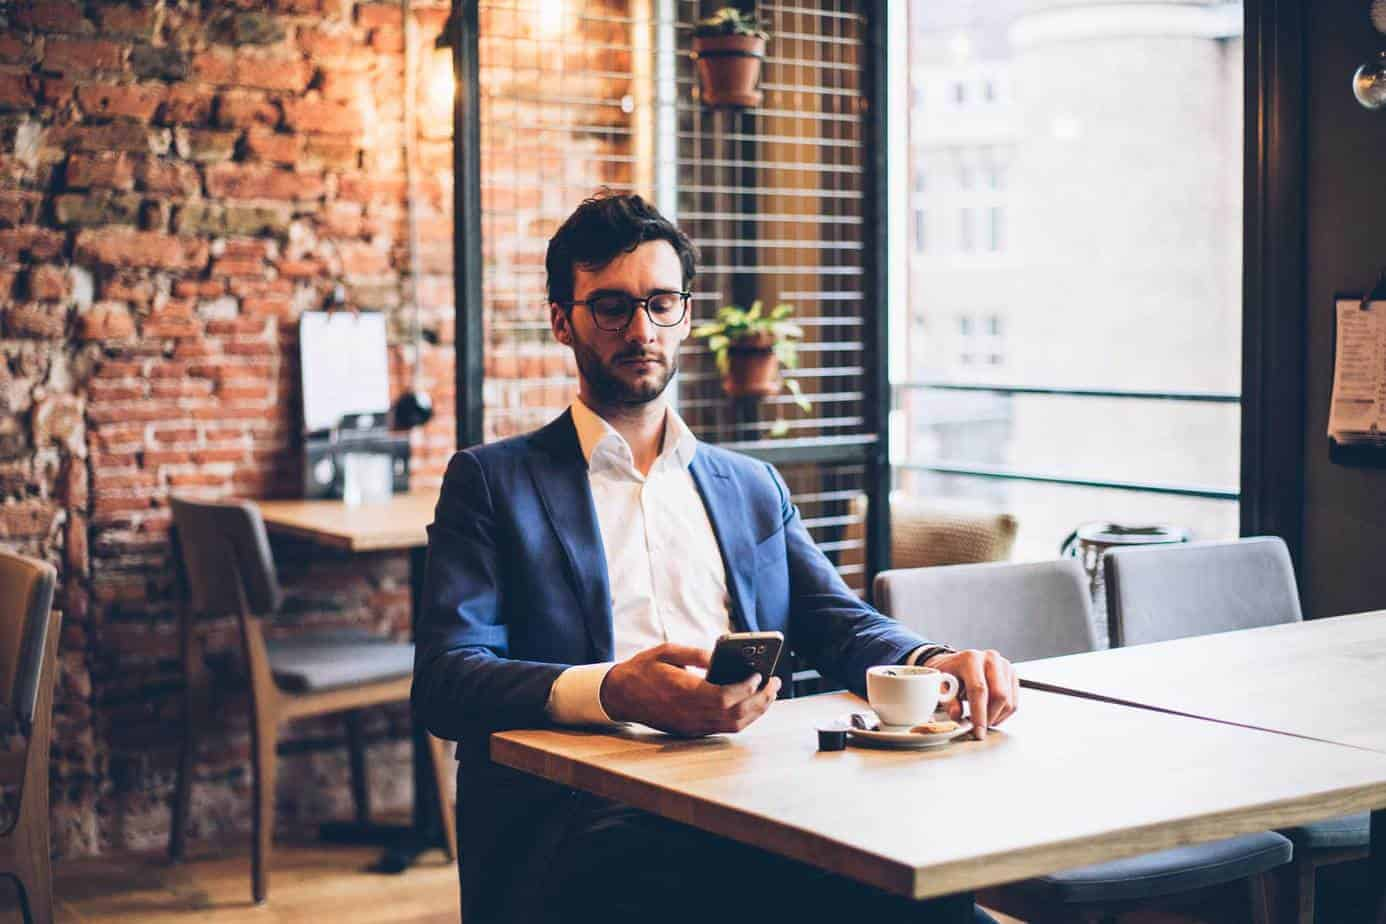 george van ekeren prisma signature sedate coffee pk bar & kitchen utrecht King arthur nederlands horlogemerk